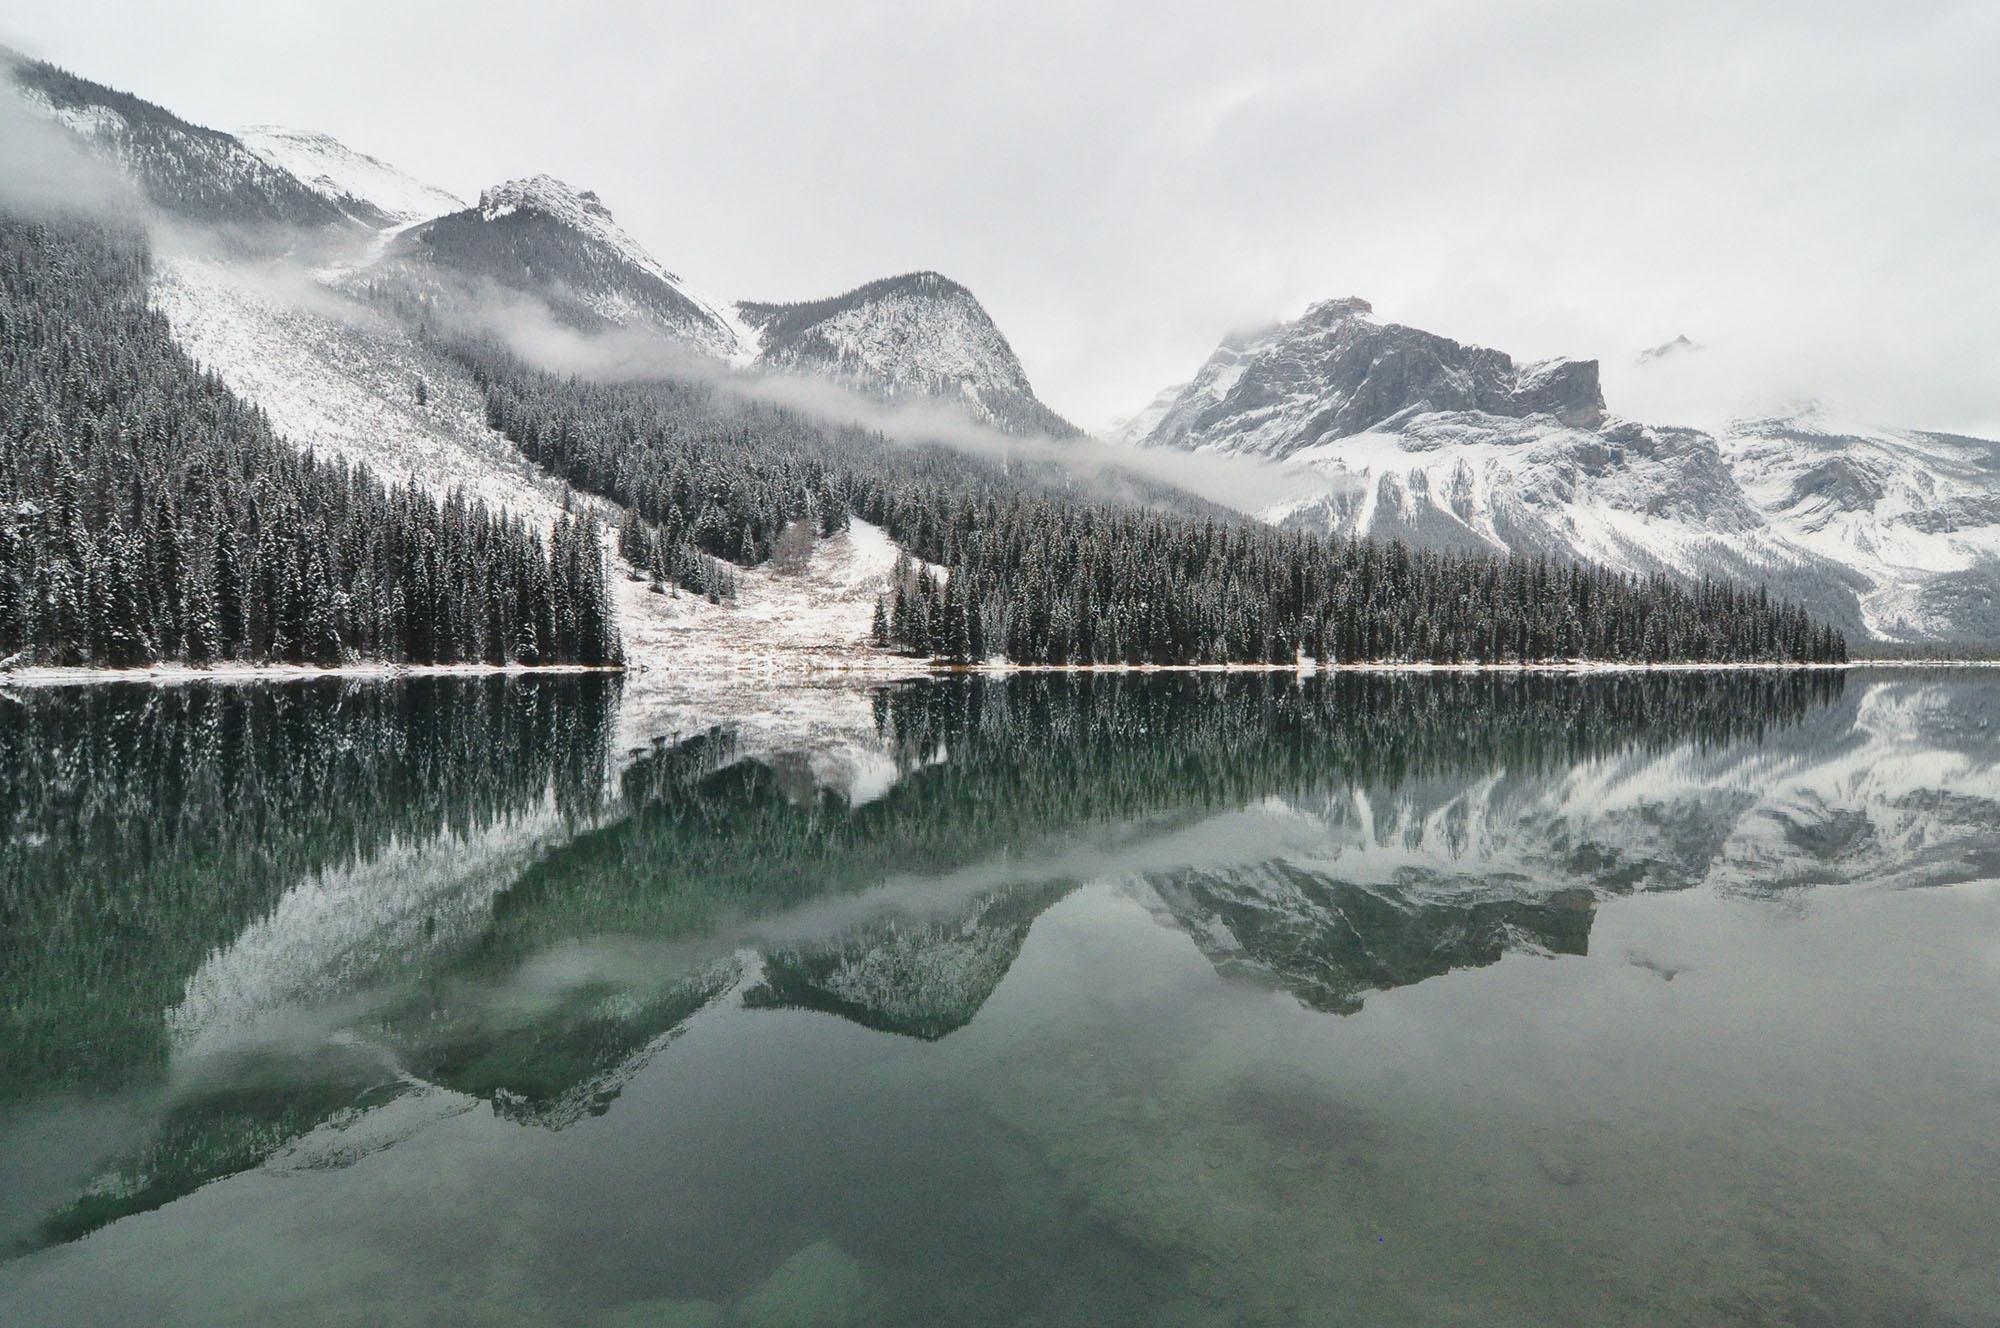 Emerald Lake in Yoho National Park, British Columbia Canada. Taken by Canadian photographer Matt Jenkins